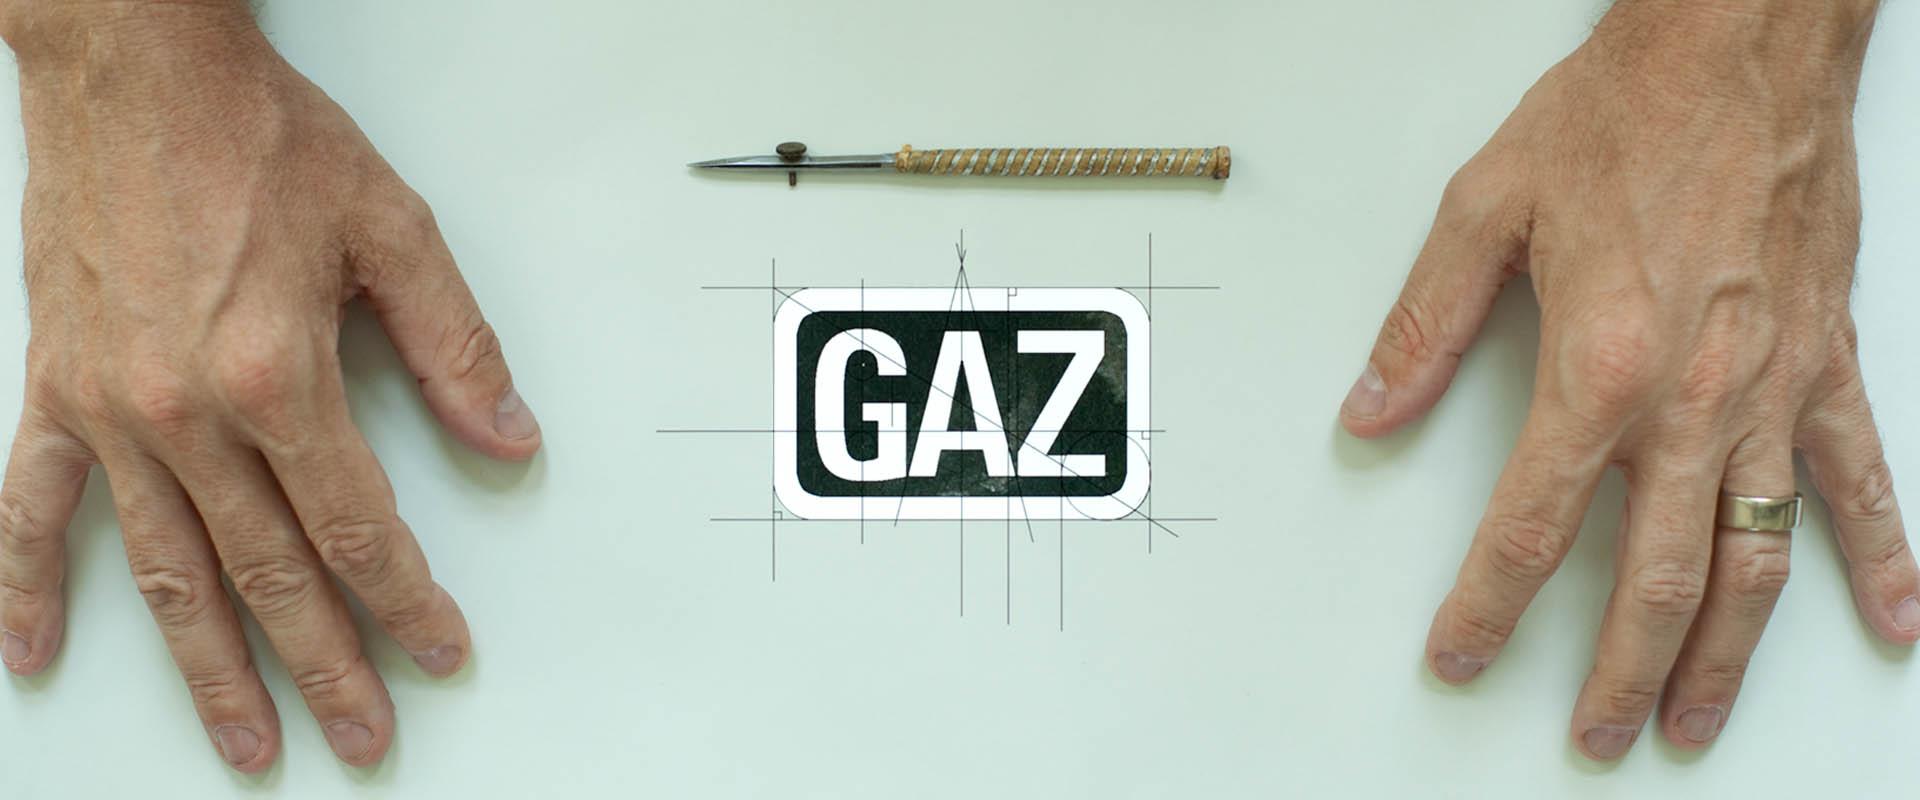 David Gaz